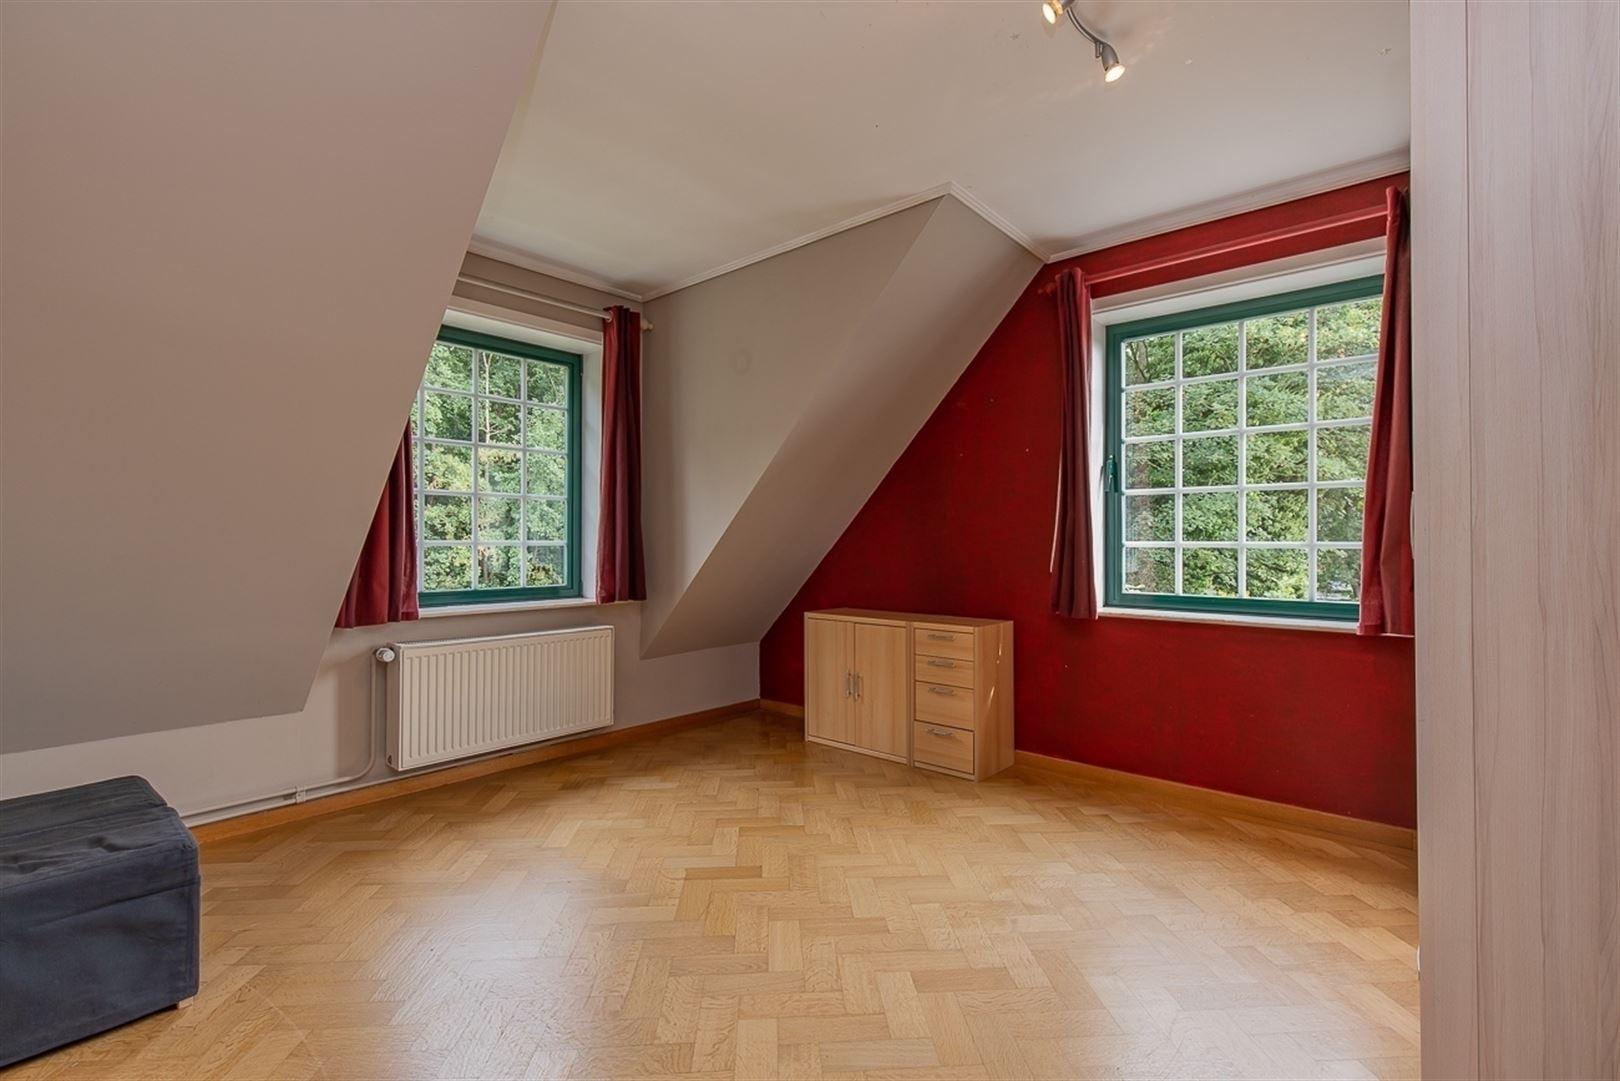 Foto 24 : Woning te 9280 LEBBEKE (België) - Prijs € 469.000